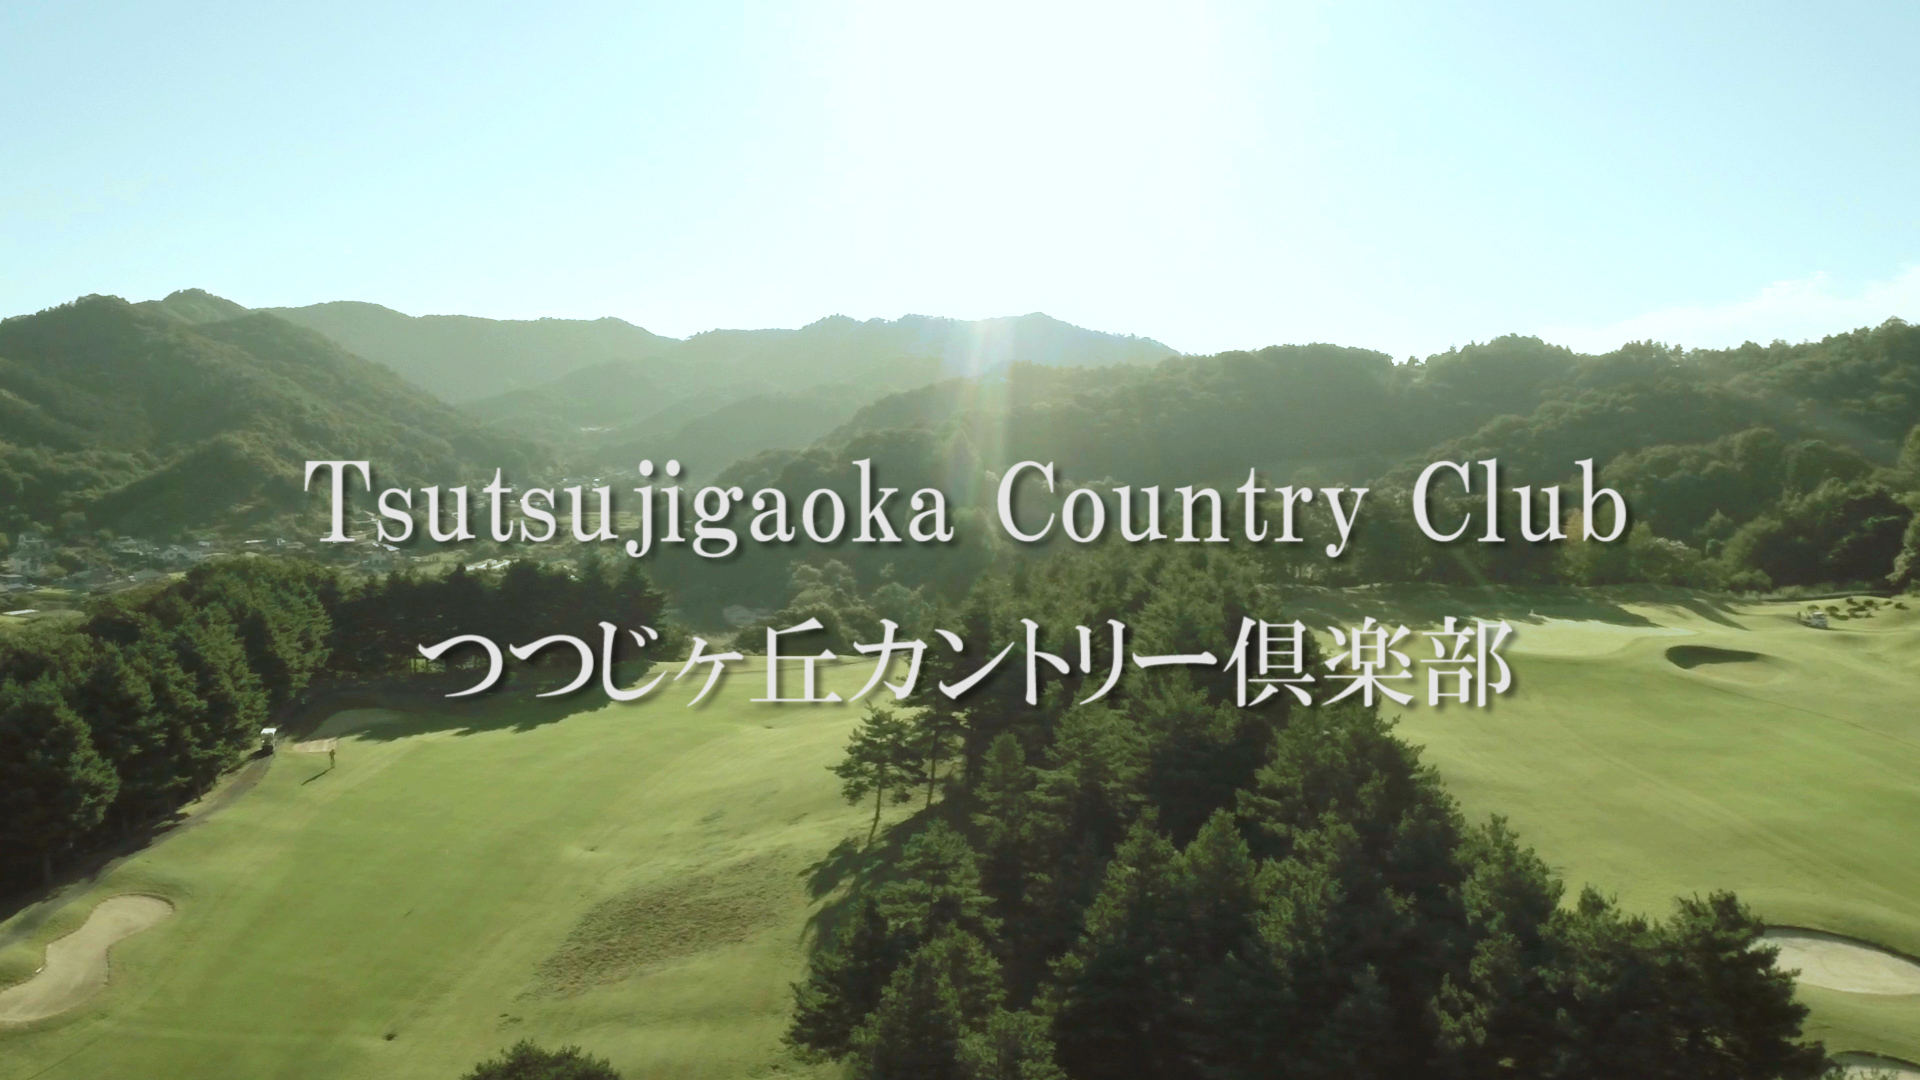 Tsutsujigaoka Country Club